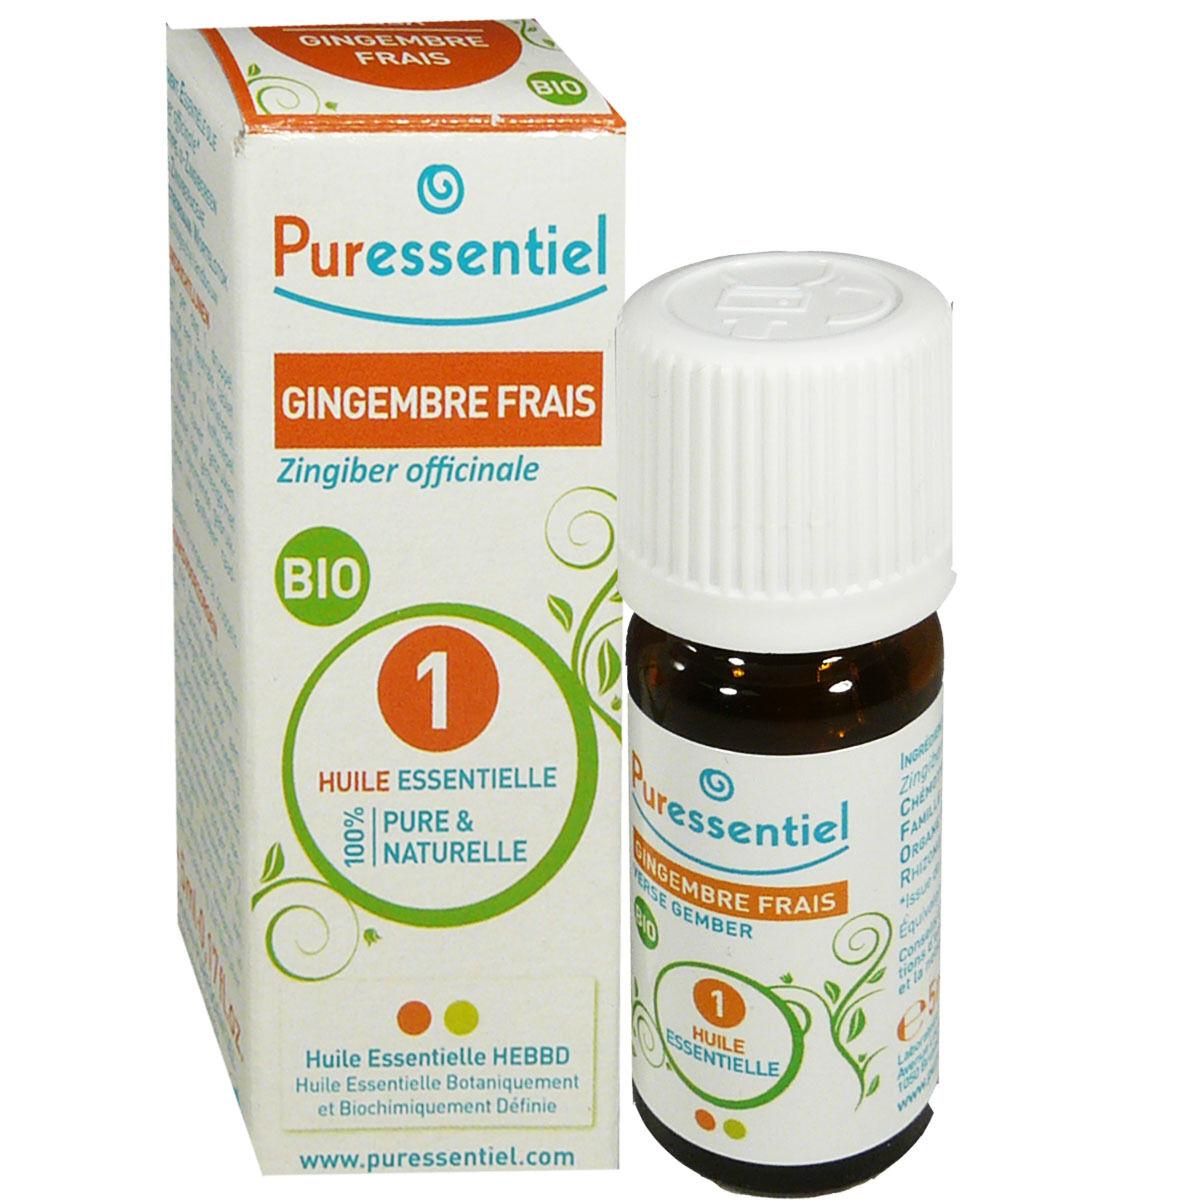 Puressentiel huile essentielle gingembre frais bio 5 ml